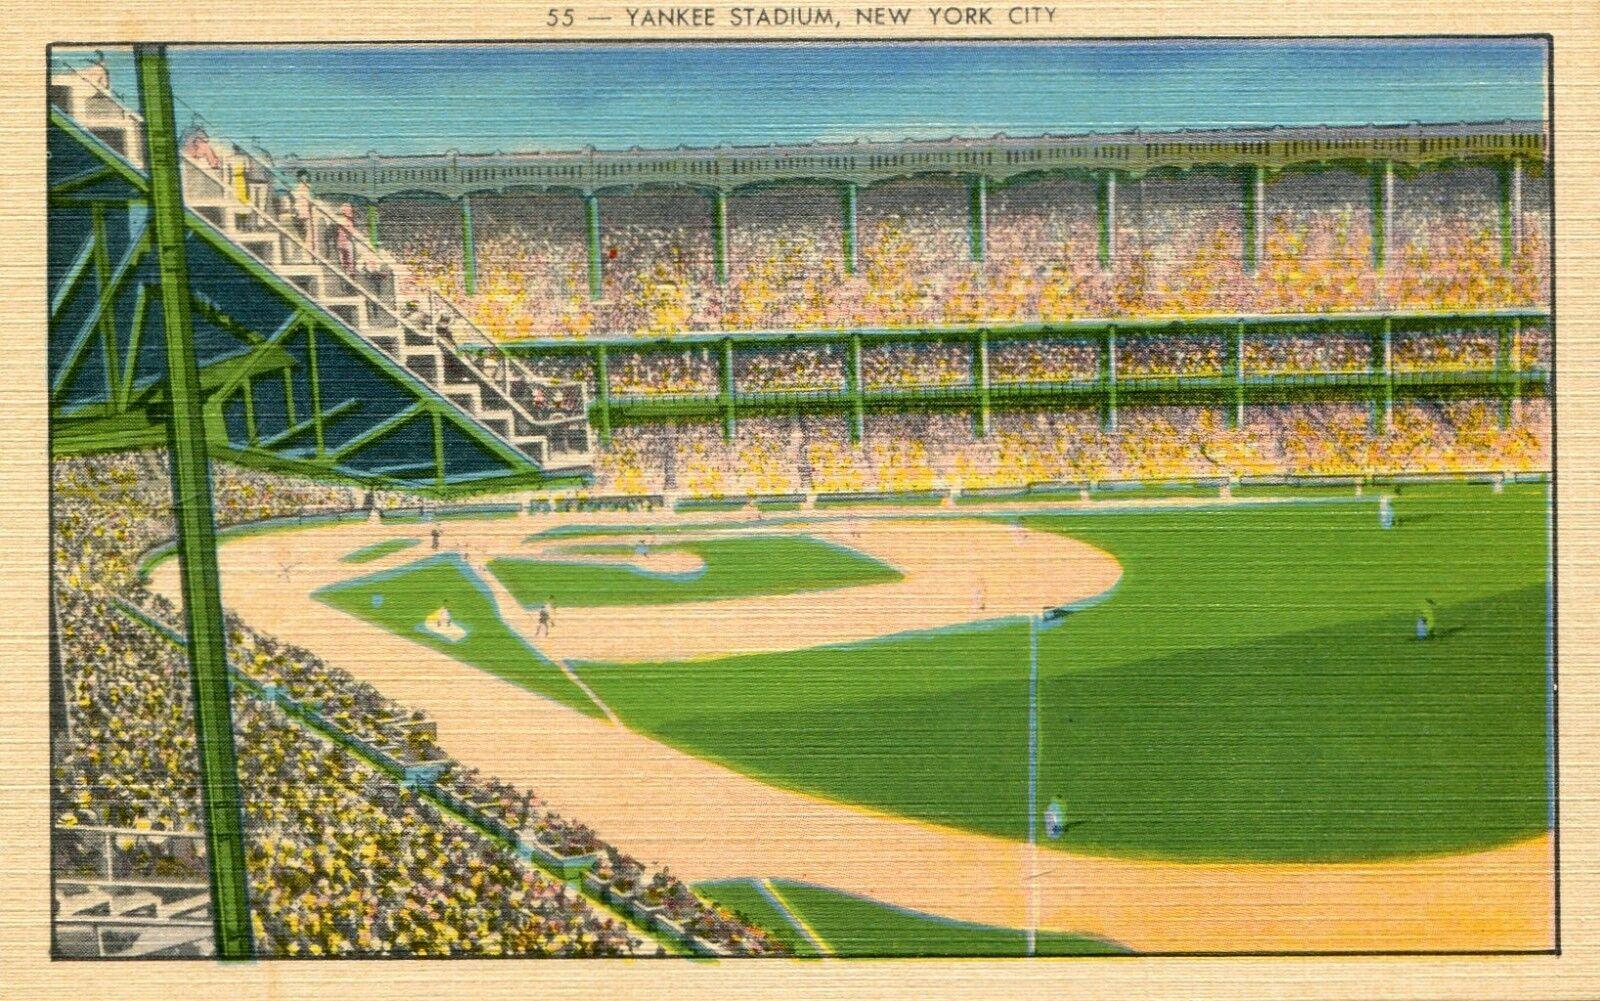 Madison Square Garden: Yankee Stadium ~New York City ~ Linen Postcard (1940s)